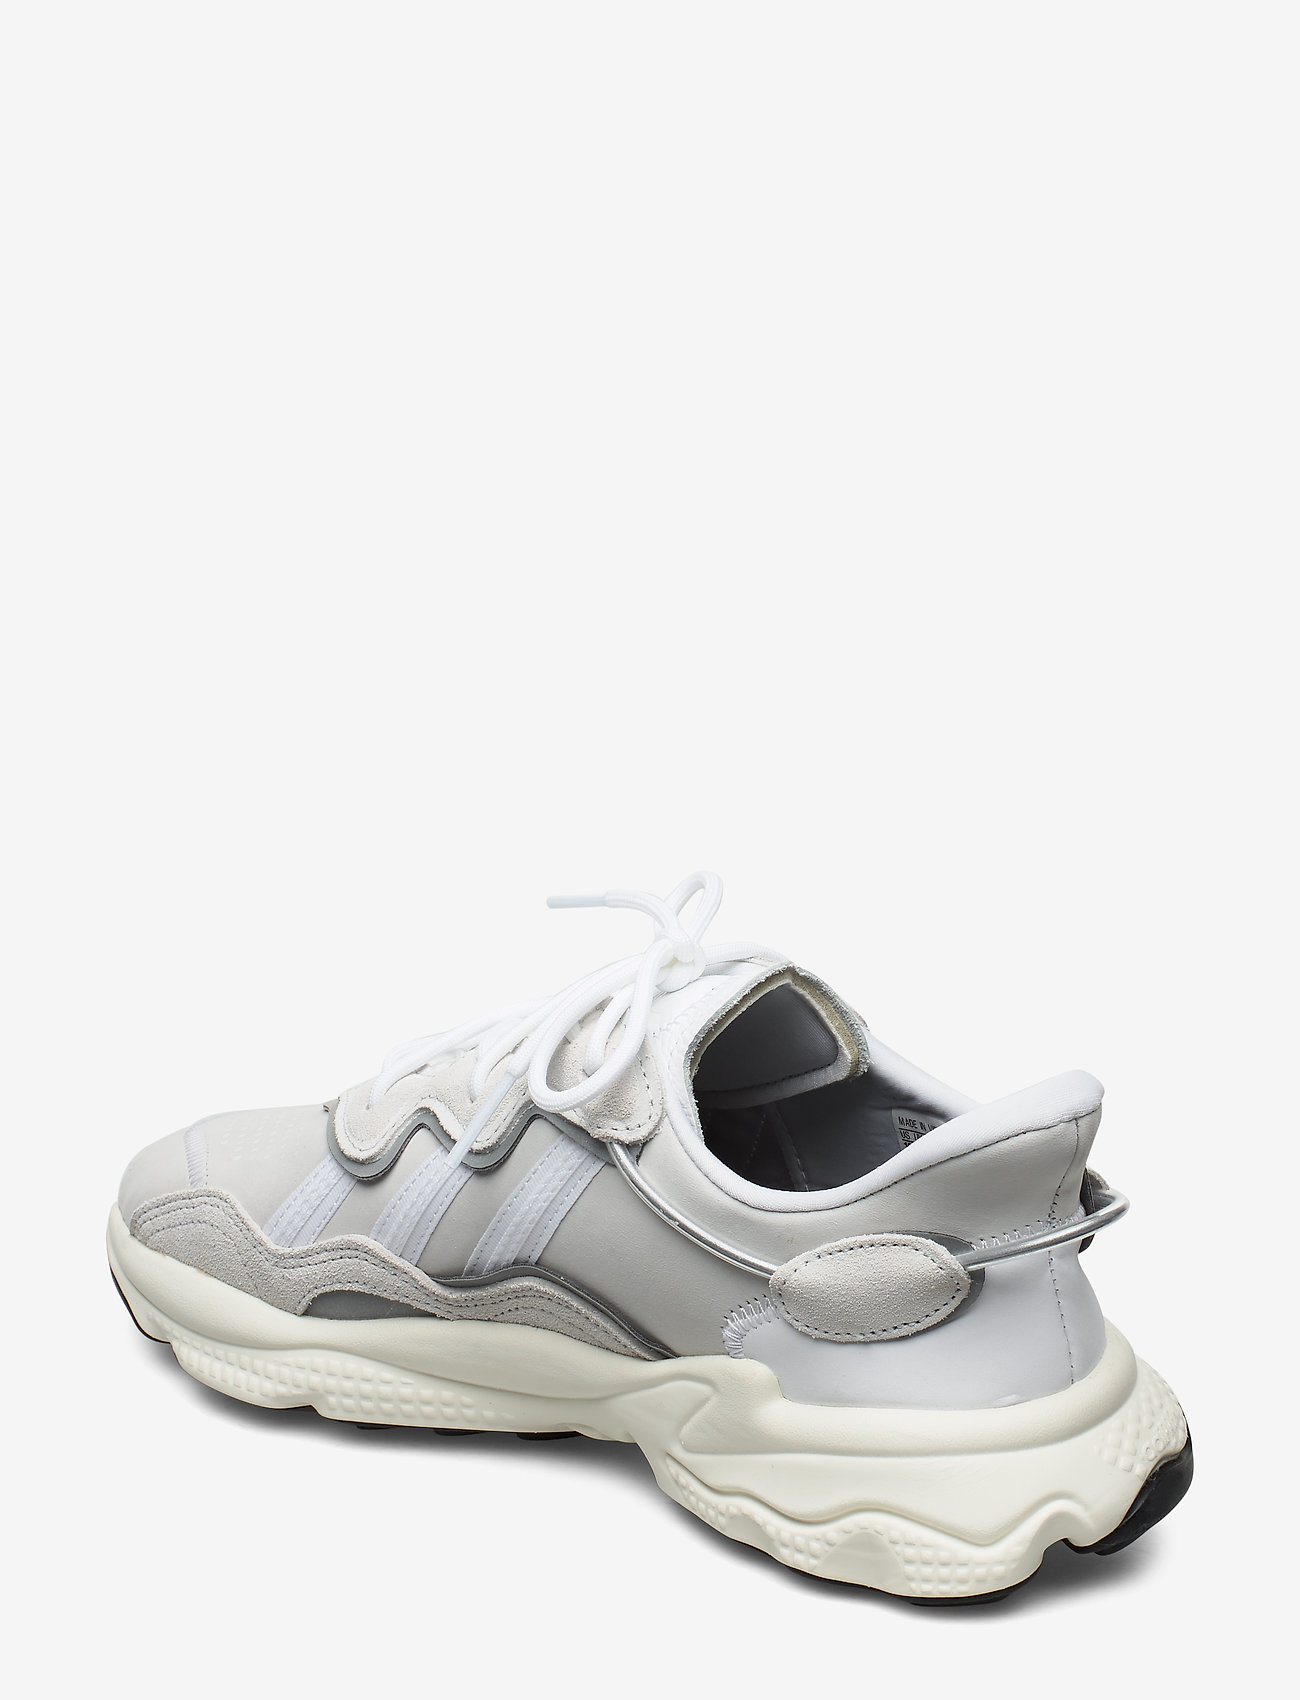 Ozweego (Crywht/ftwwht/owhite) - adidas Originals O2m8KI